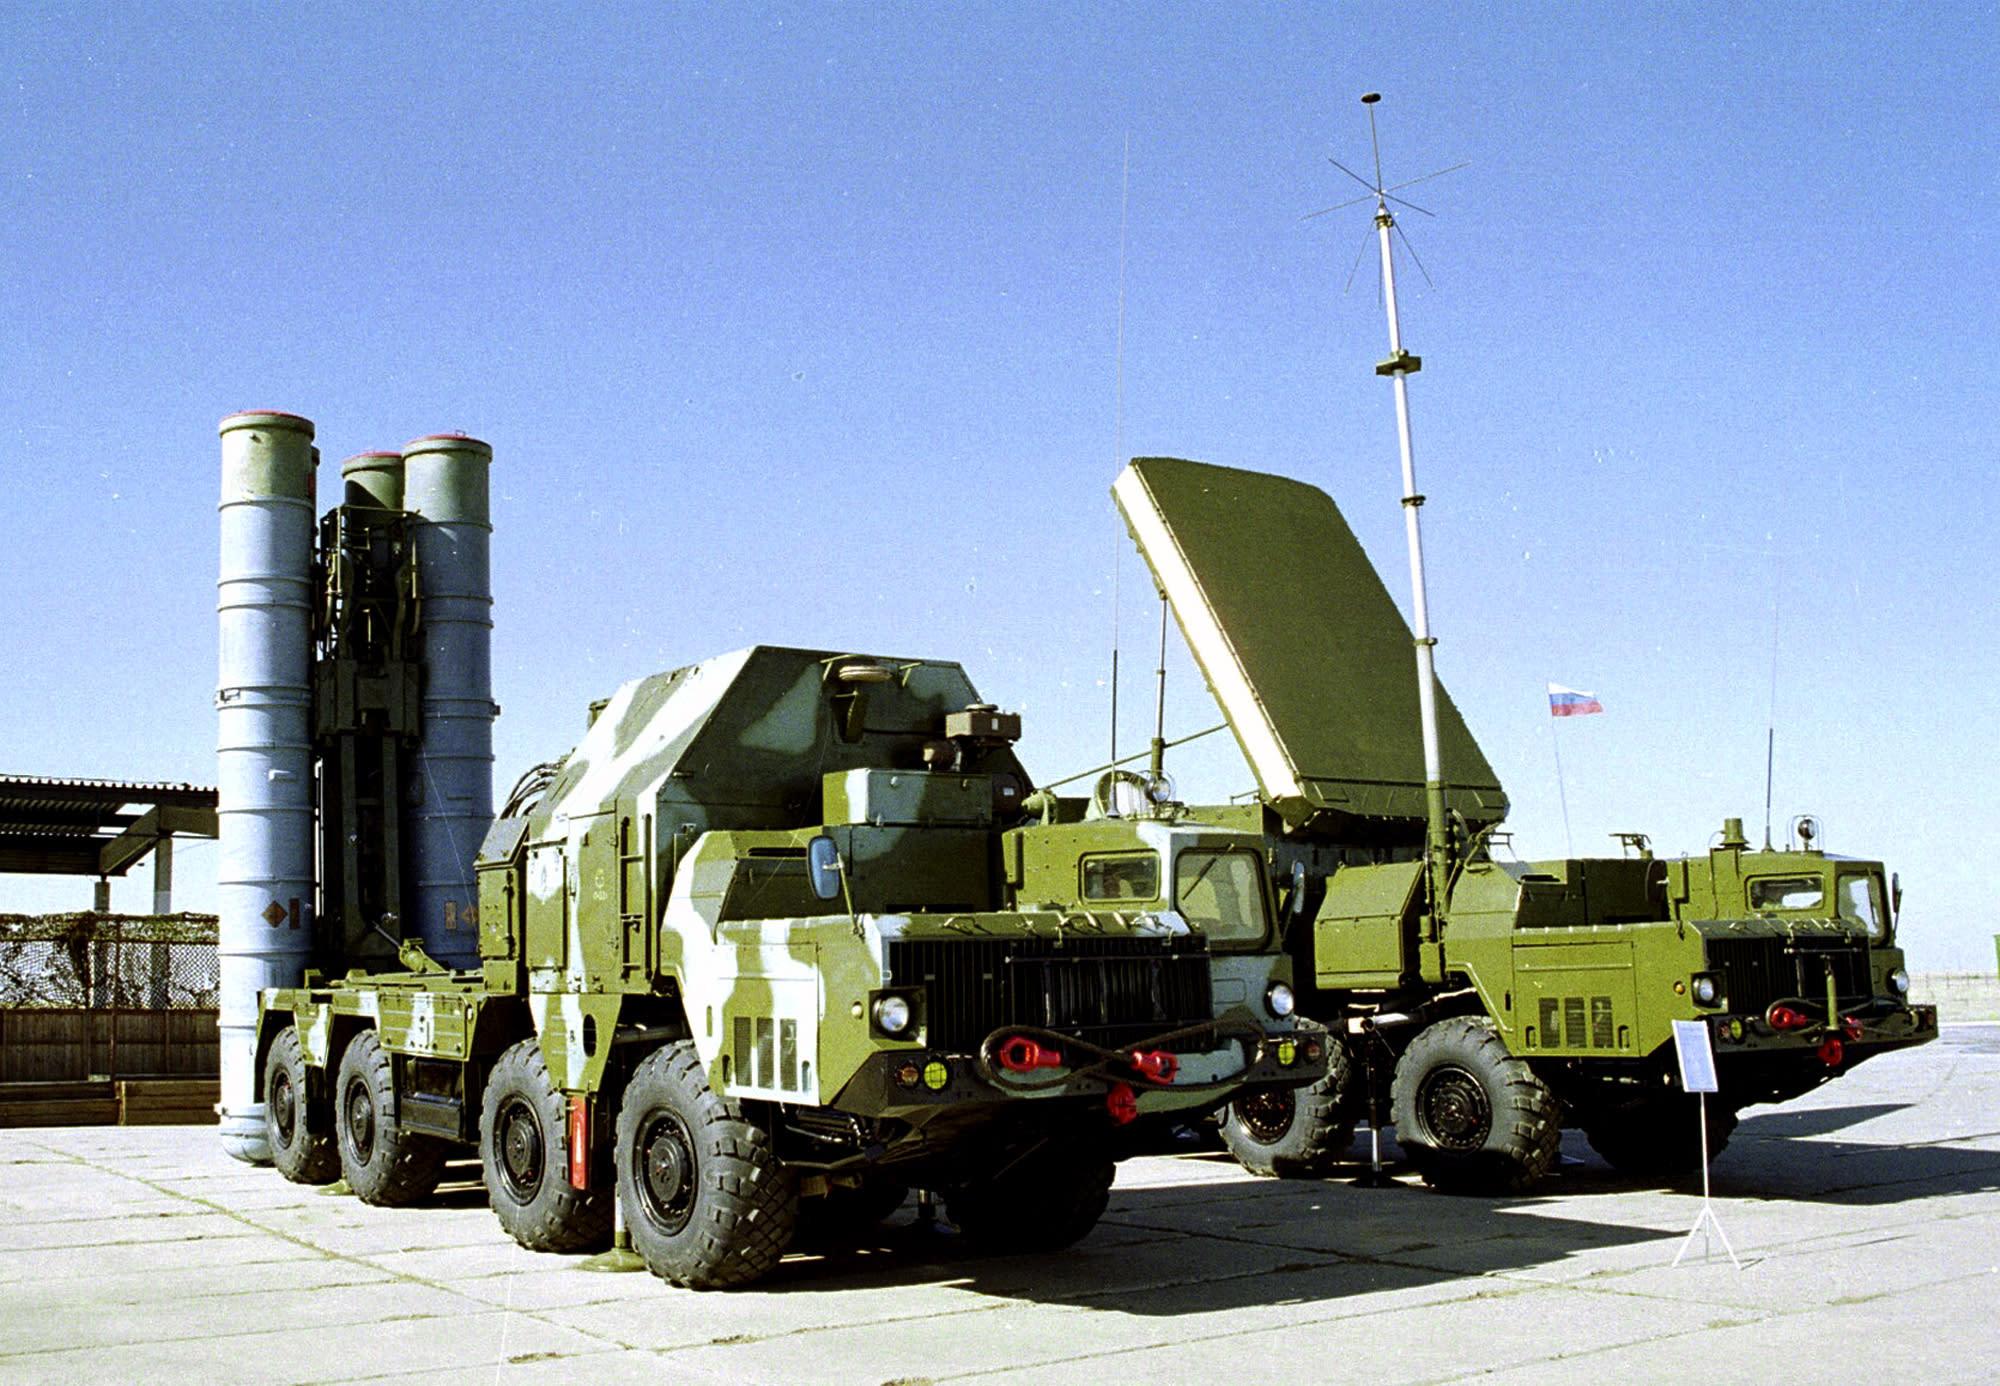 S 300 missile systems vs patriot - S 300 Missile Systems Vs Patriot 46